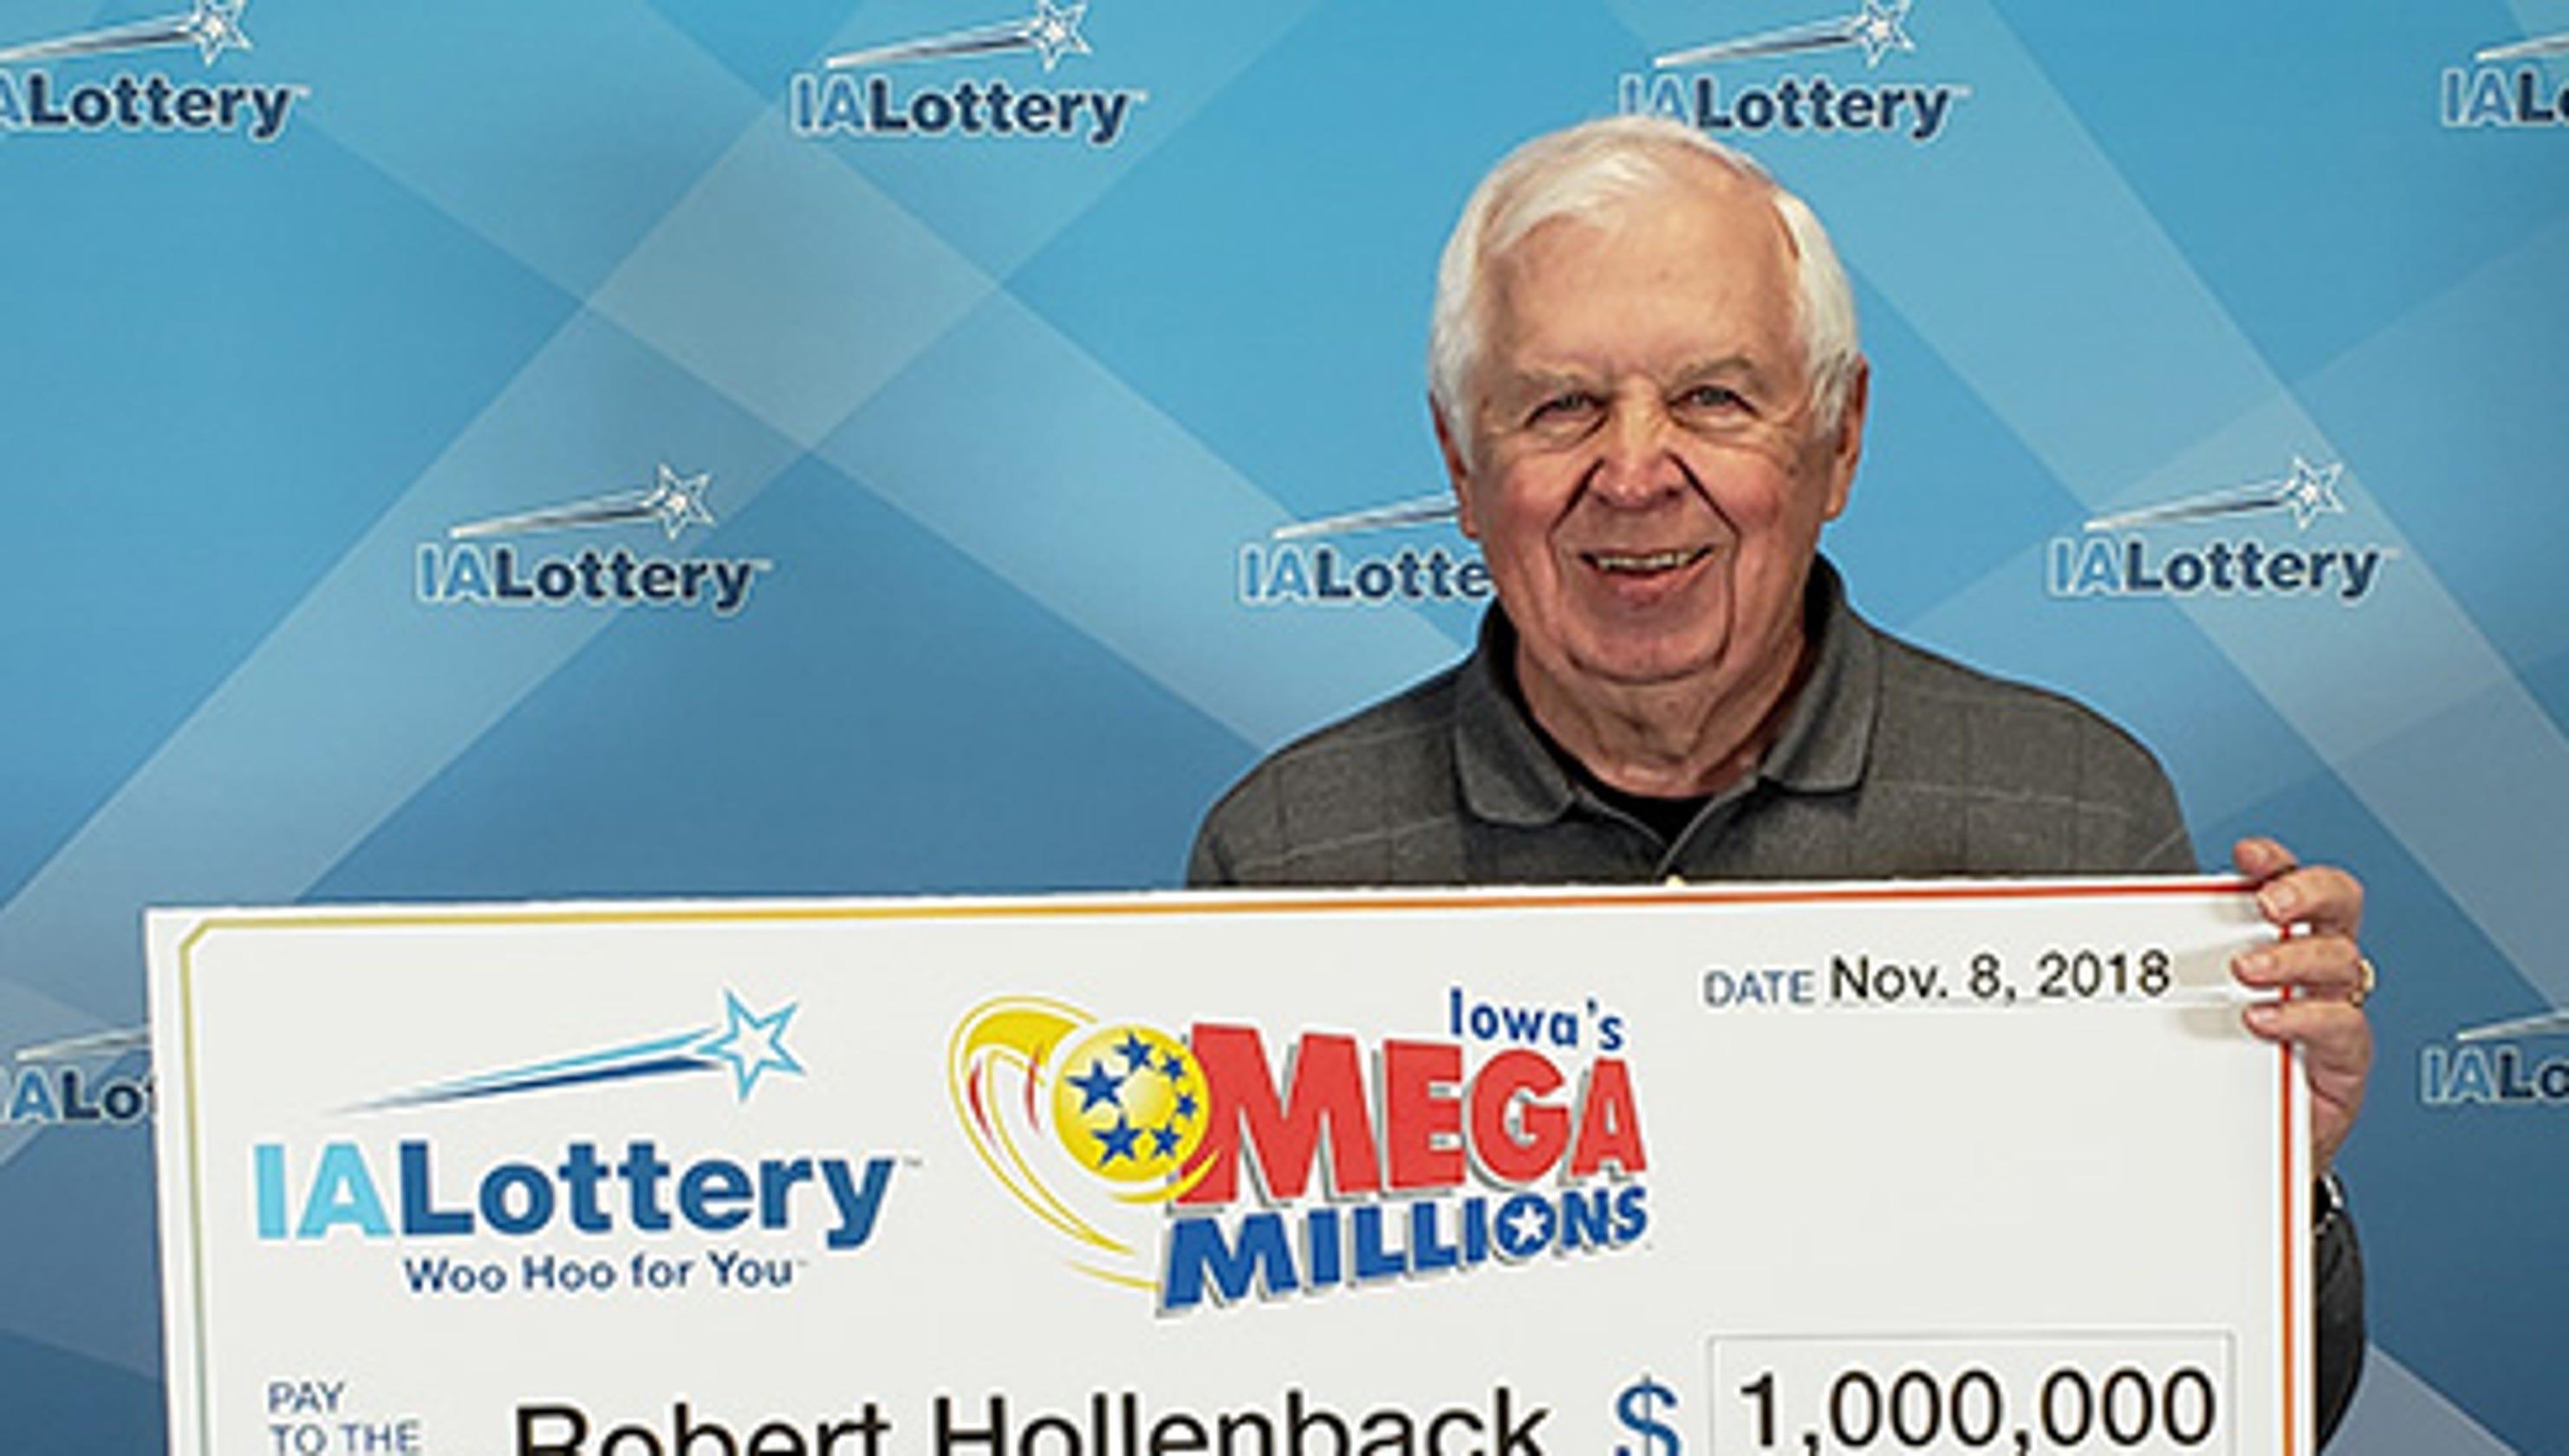 Iowa Lottery: $1M Mega Millions winner was a number short of